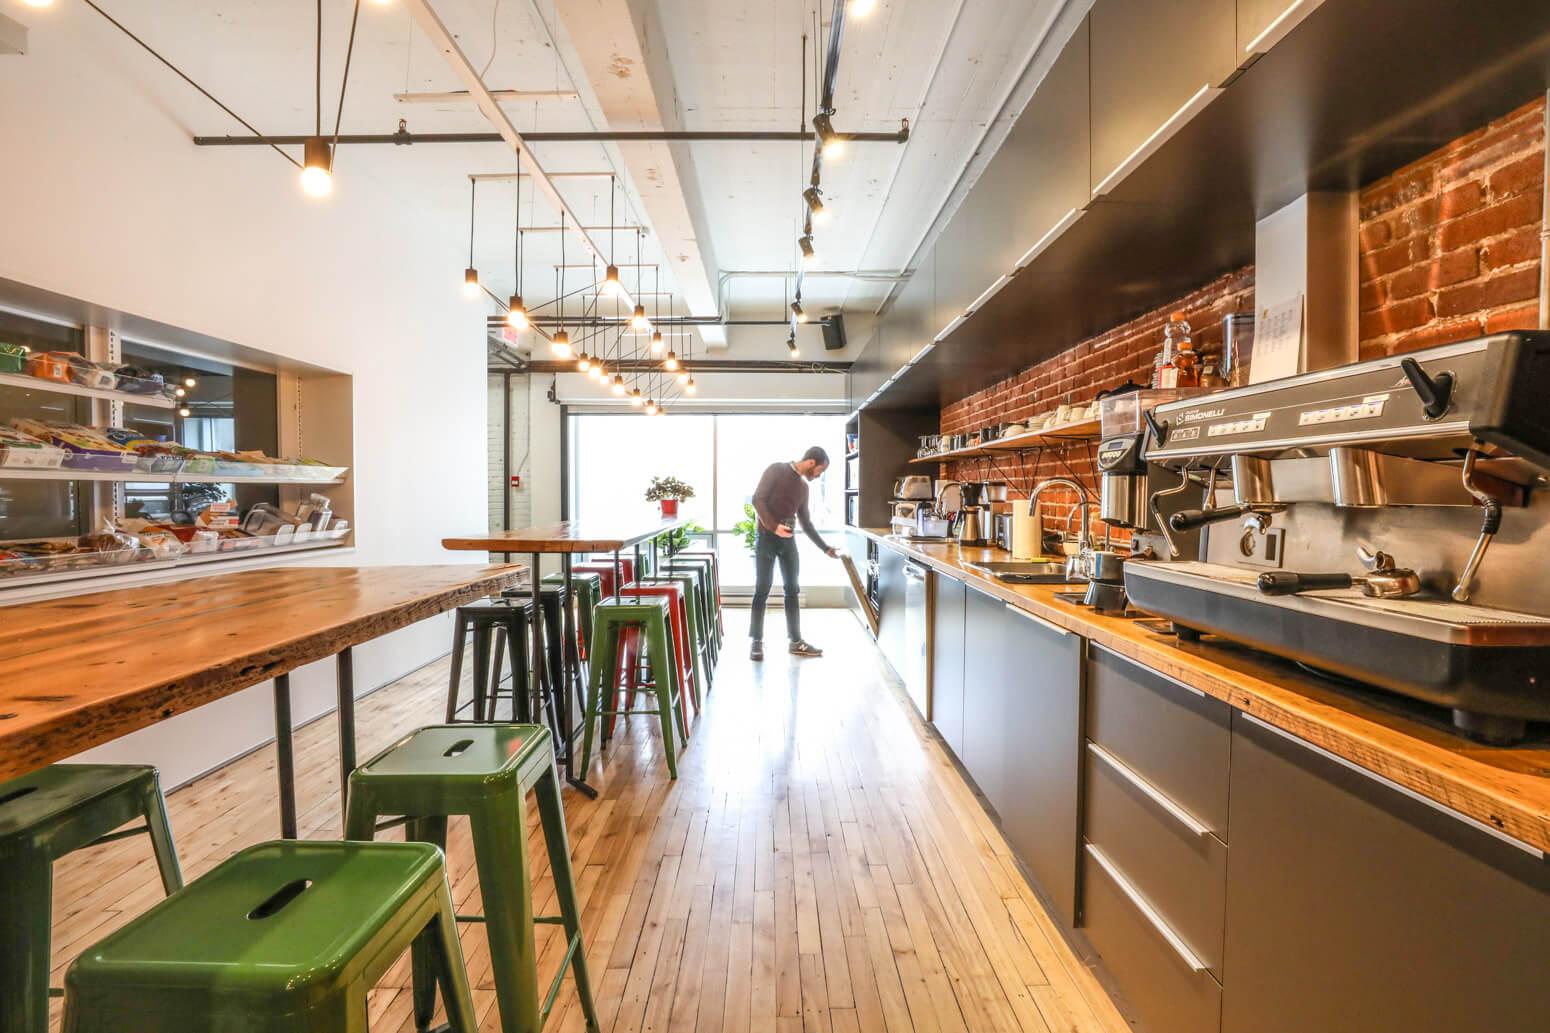 Shutterstock Montreal Office Killer Spaces-12